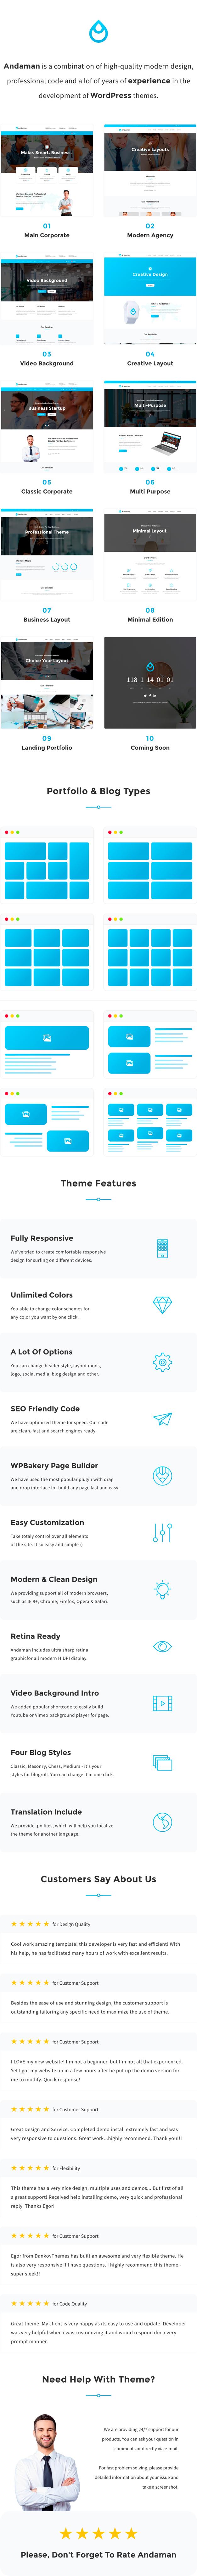 Andaman - Creative & Business WordPress Theme - 1